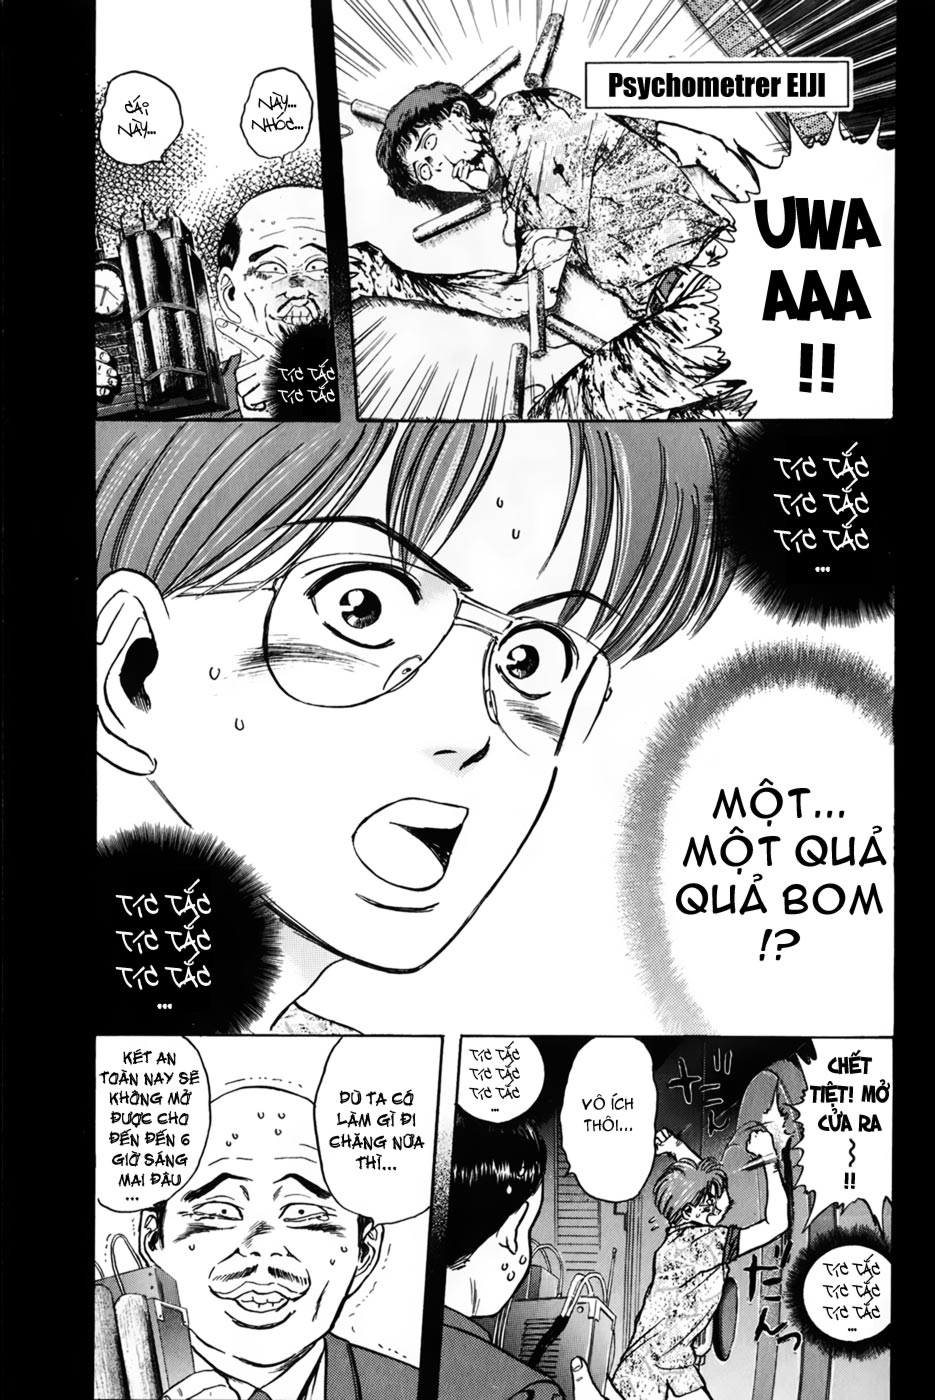 Psychometrer Eiji chapter 23 trang 3